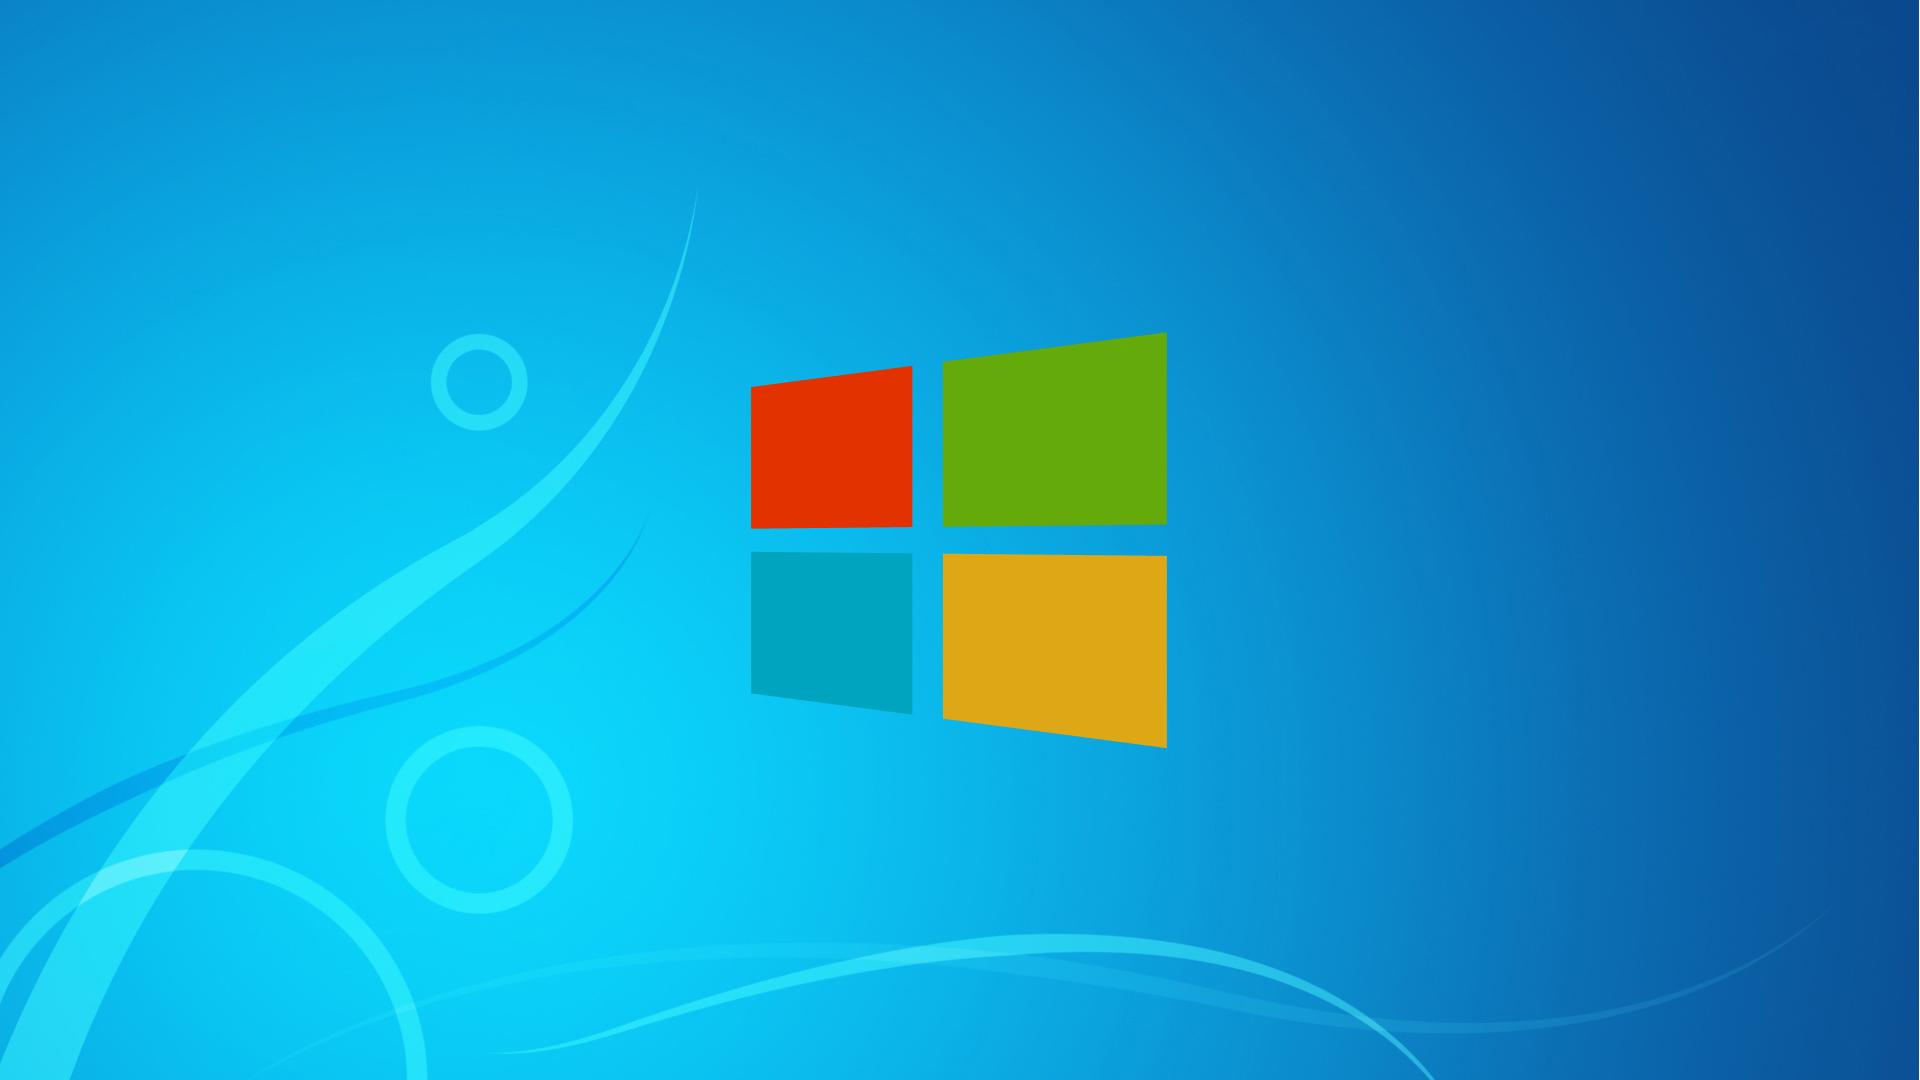 Microsoft windows hd desktop background wallpaper amazing 1920x1080 voltagebd Choice Image